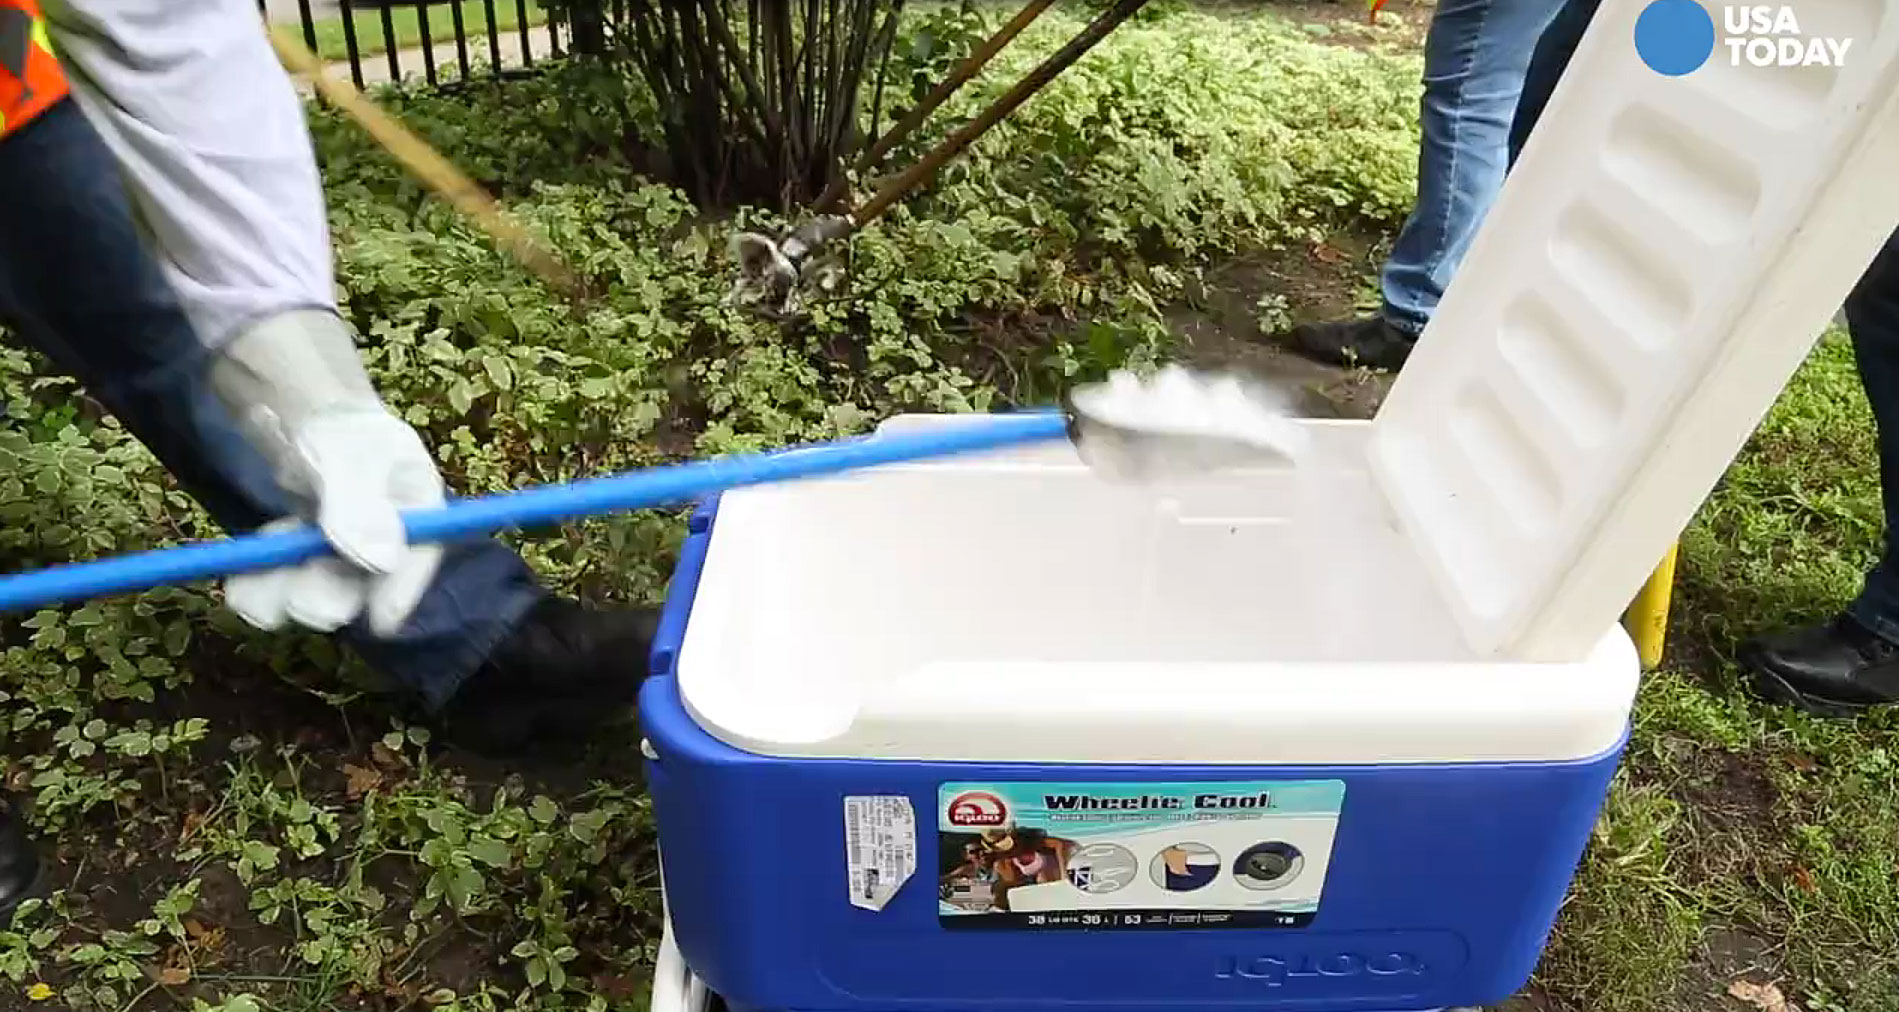 US EPA a las grandes ciudades: paren de matar ratas con hielo seco ...